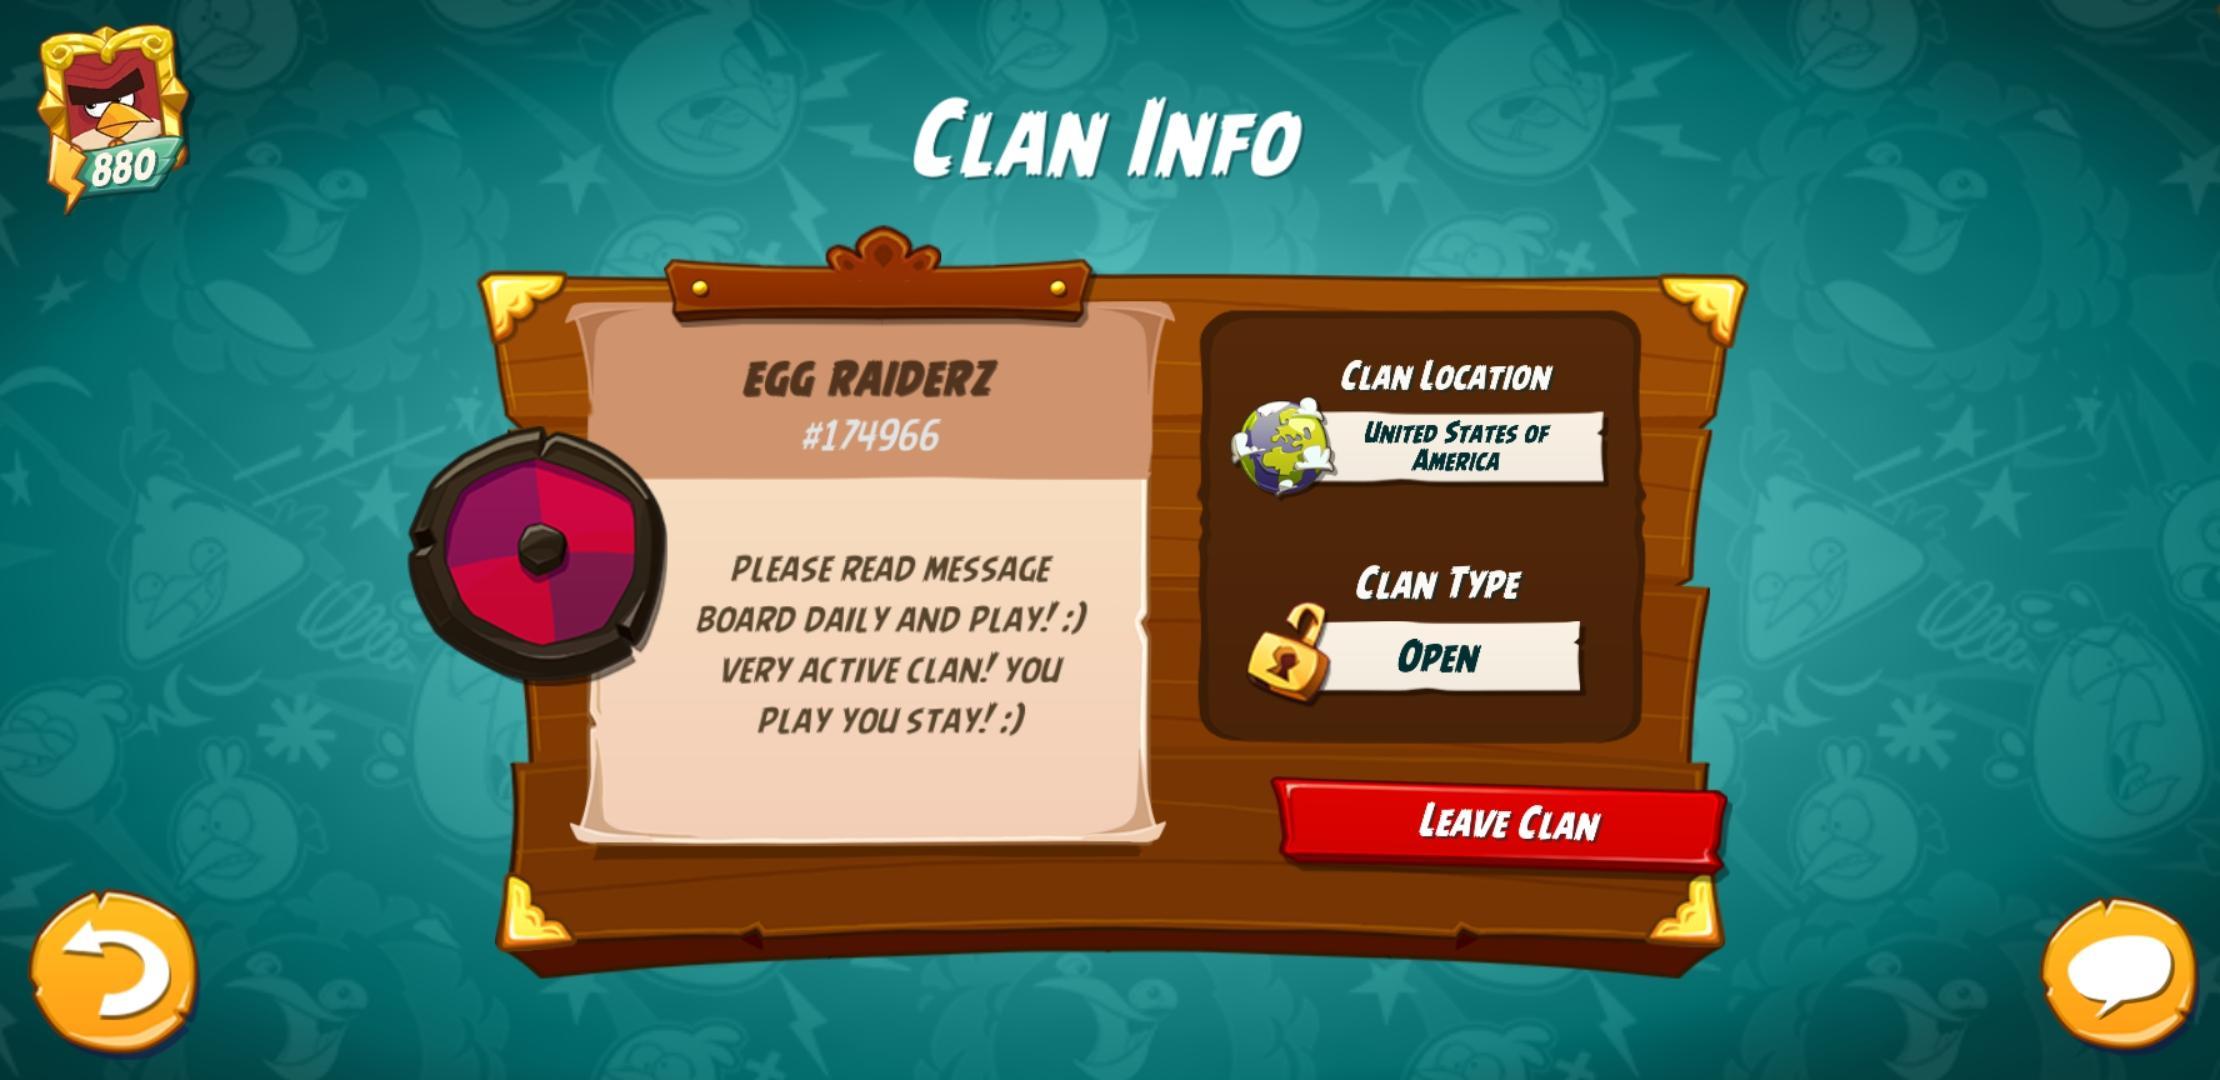 Clan info